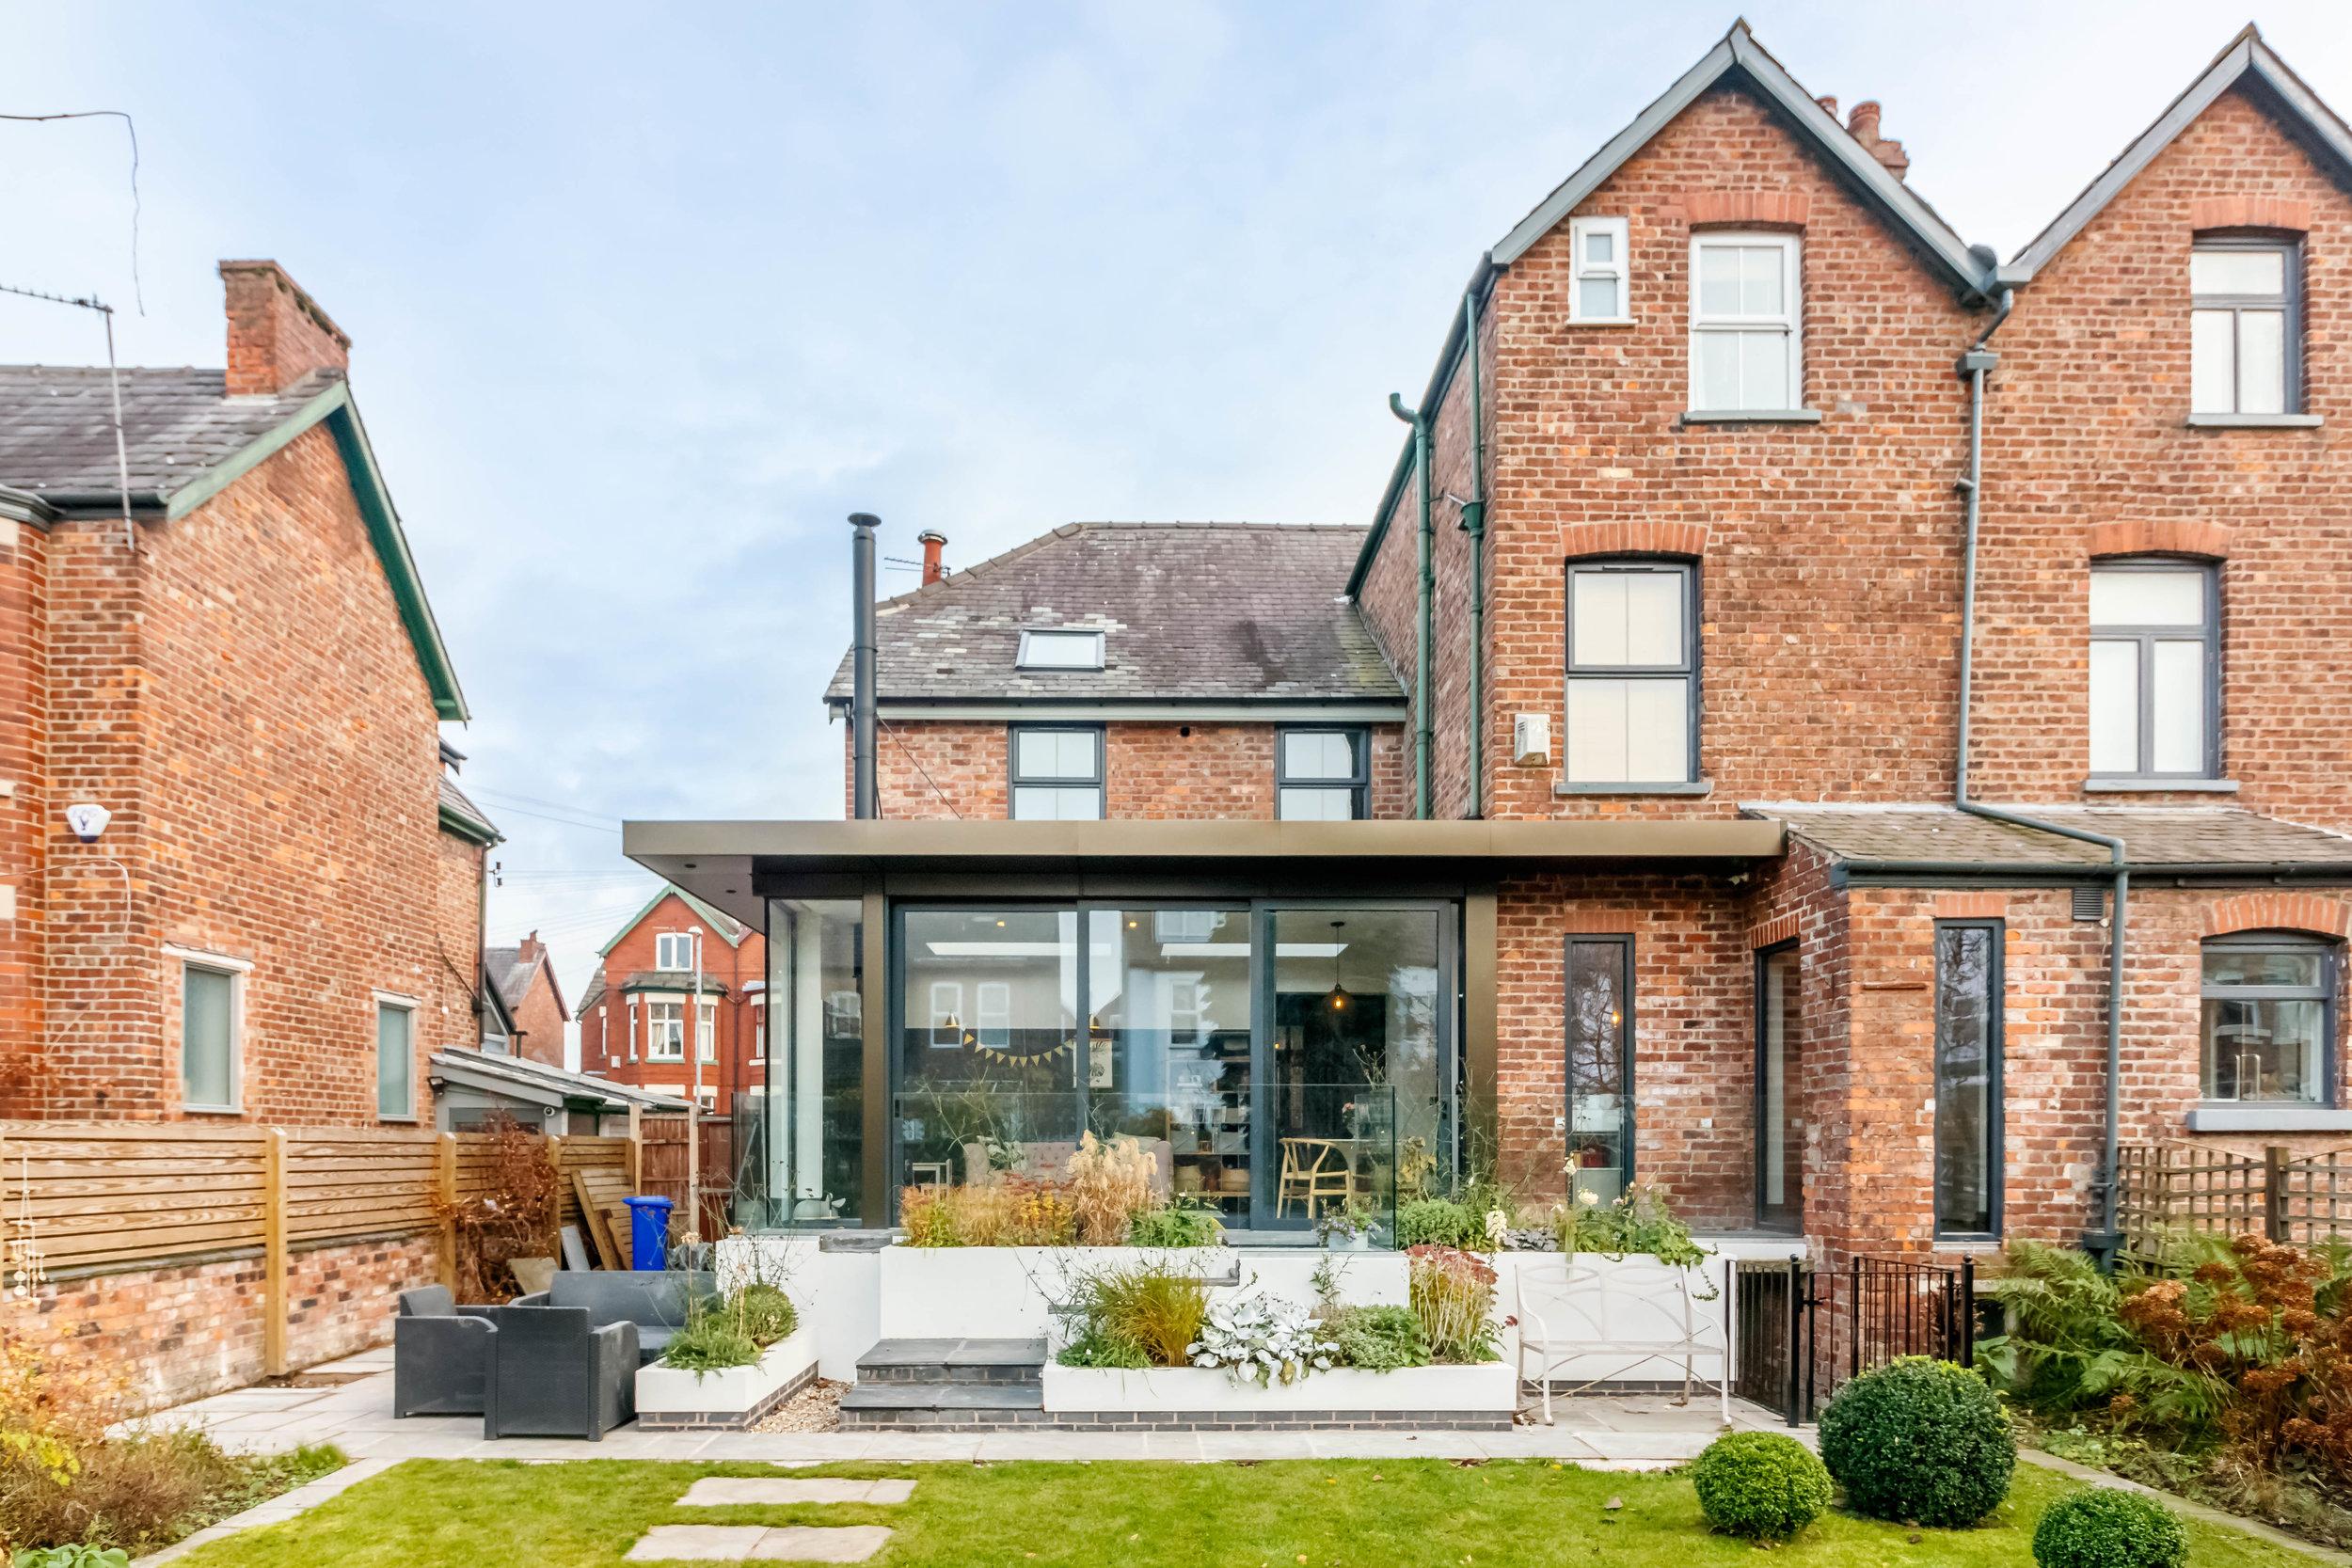 PropertyPhotographs-4160.jpg